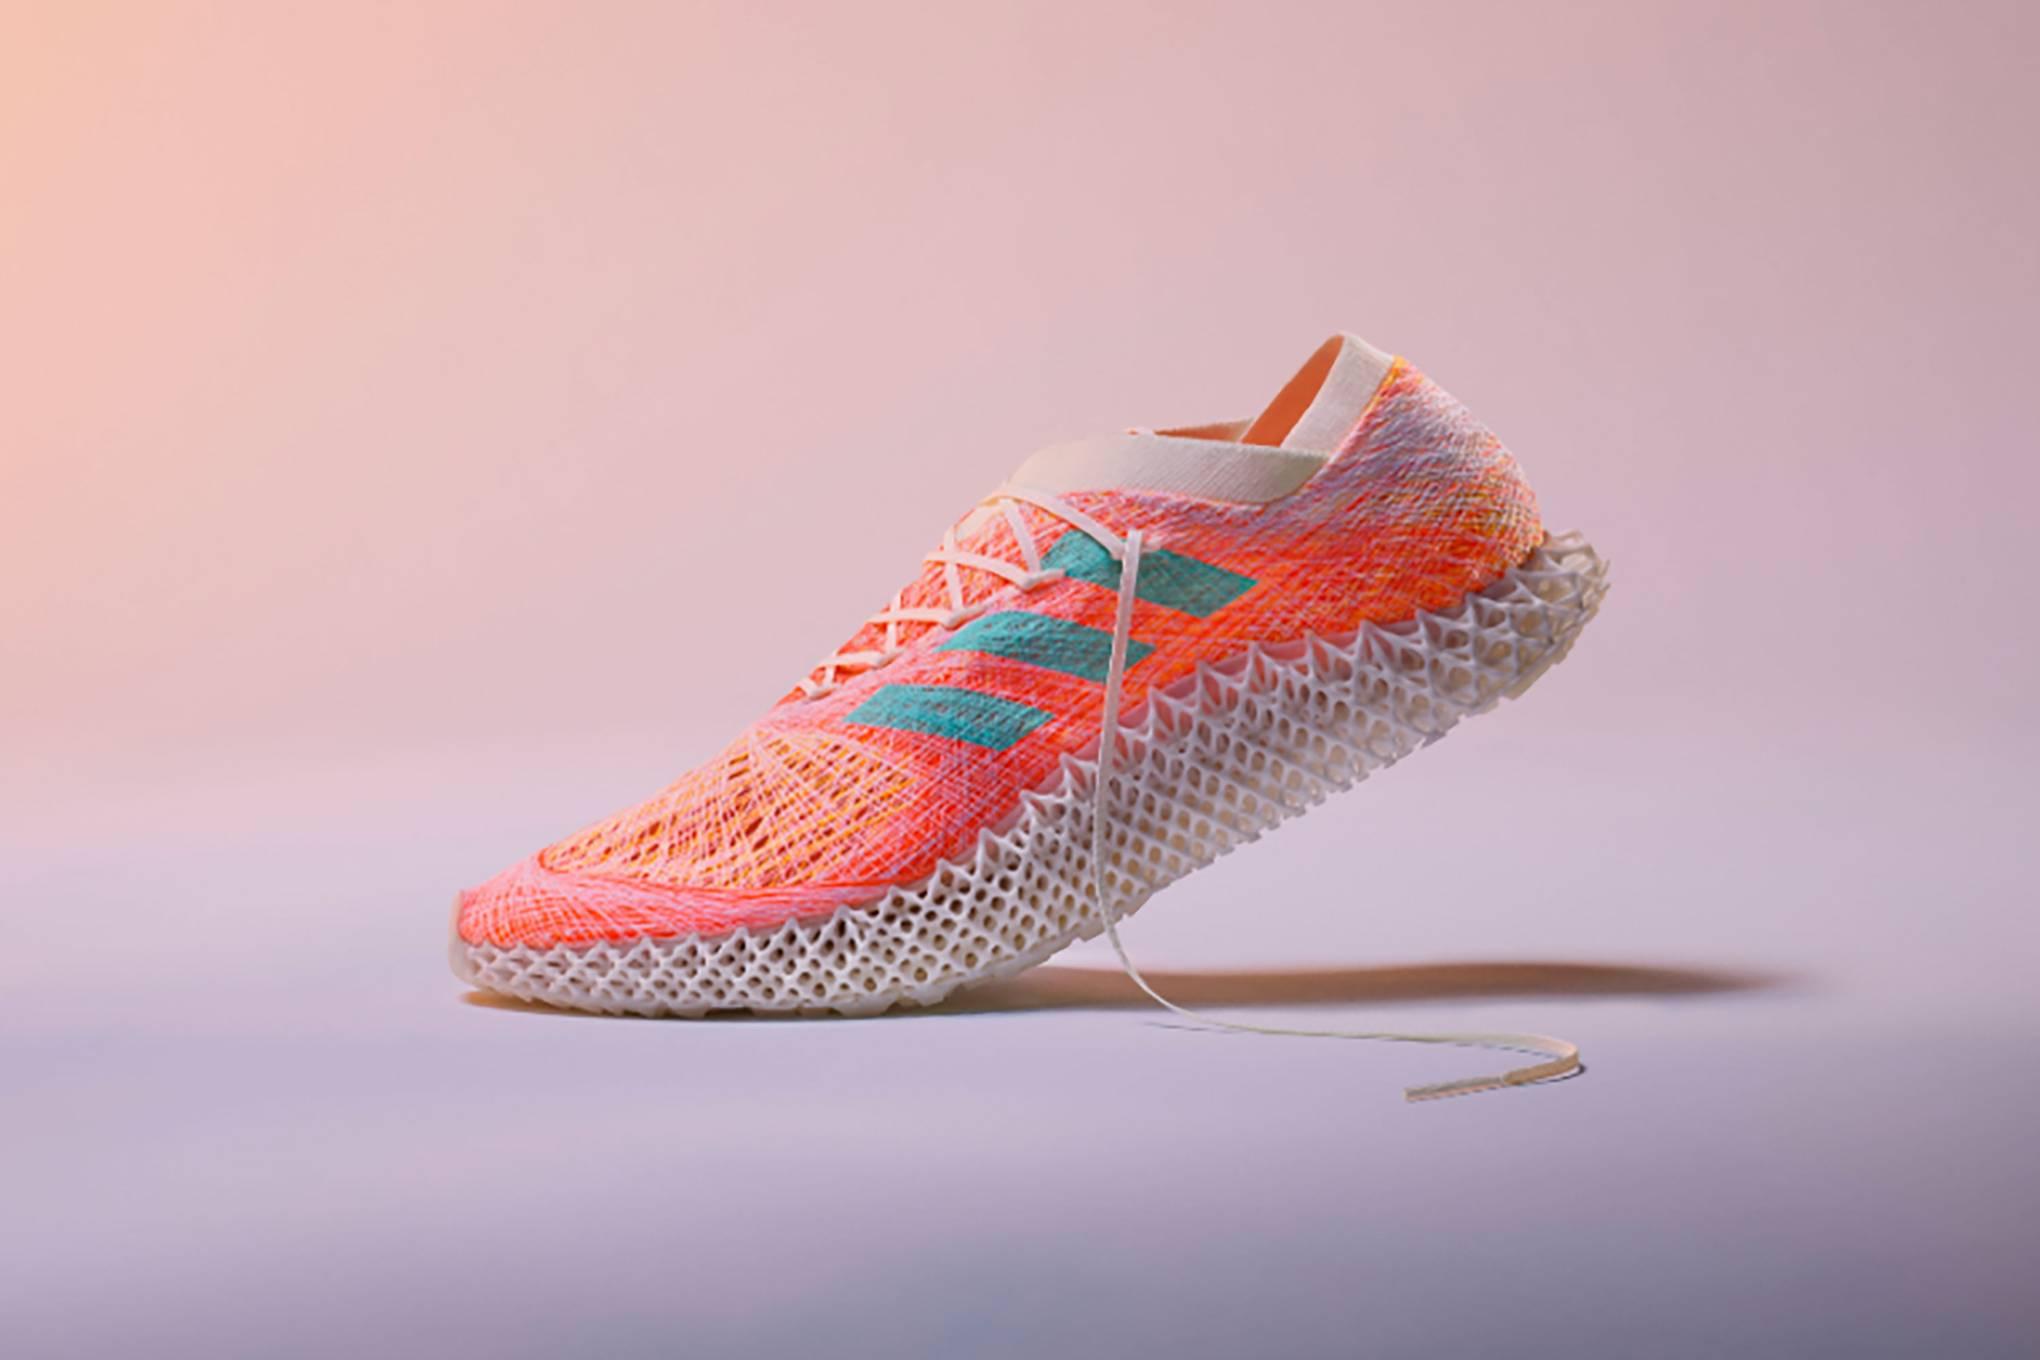 chaussure sentrale adidas